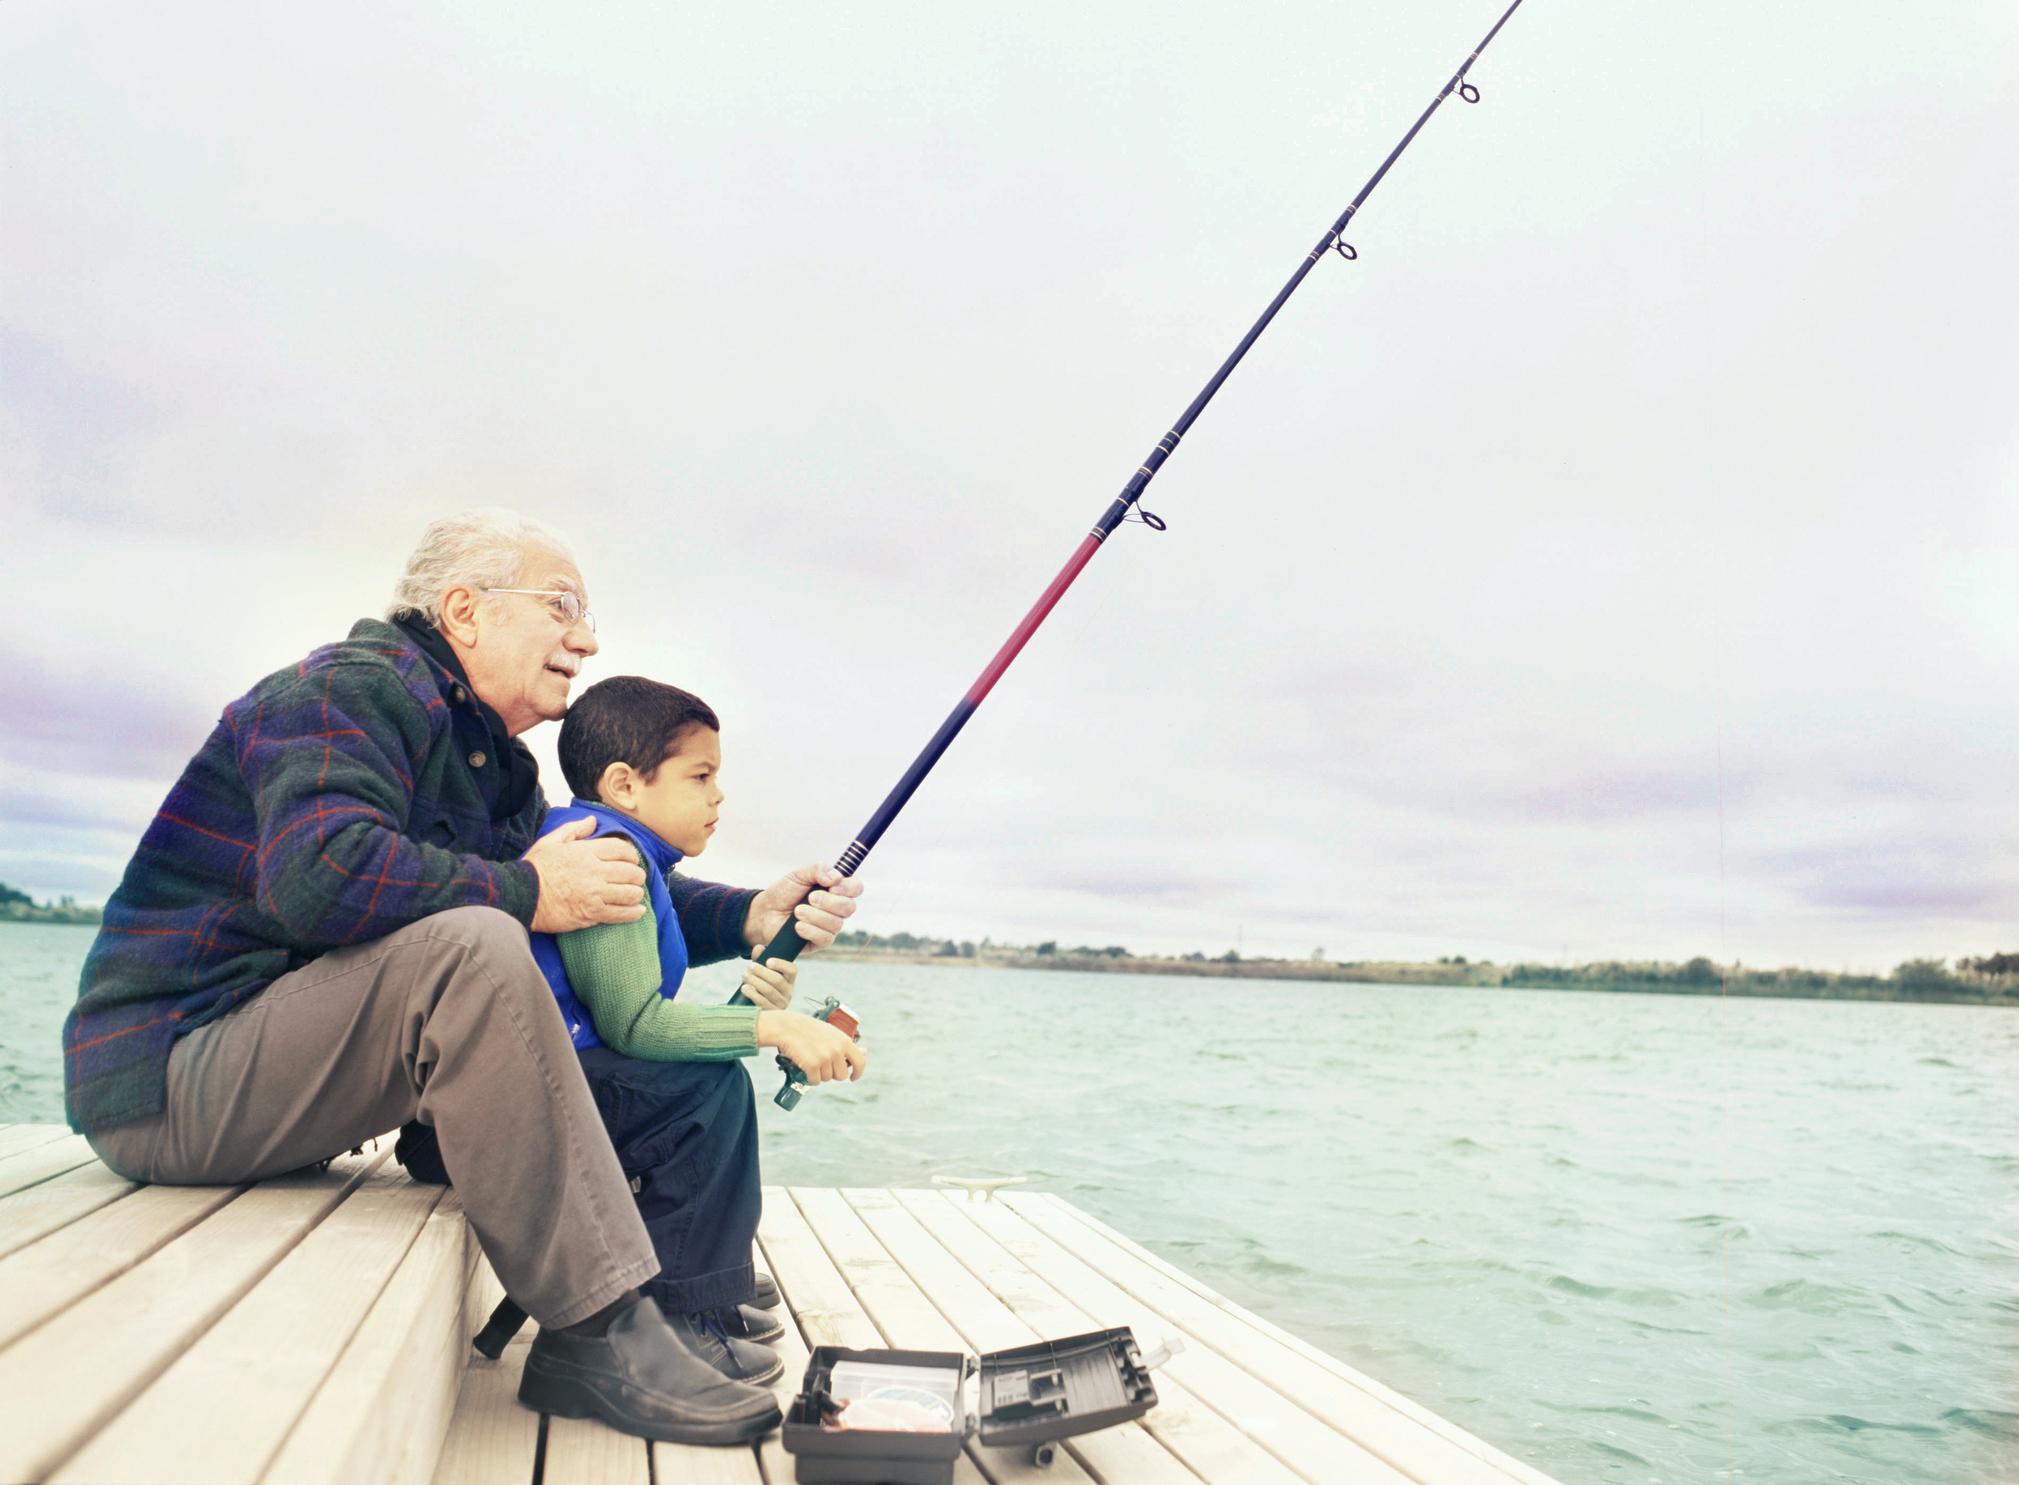 abuelo-y-nieto-pescando.jpg